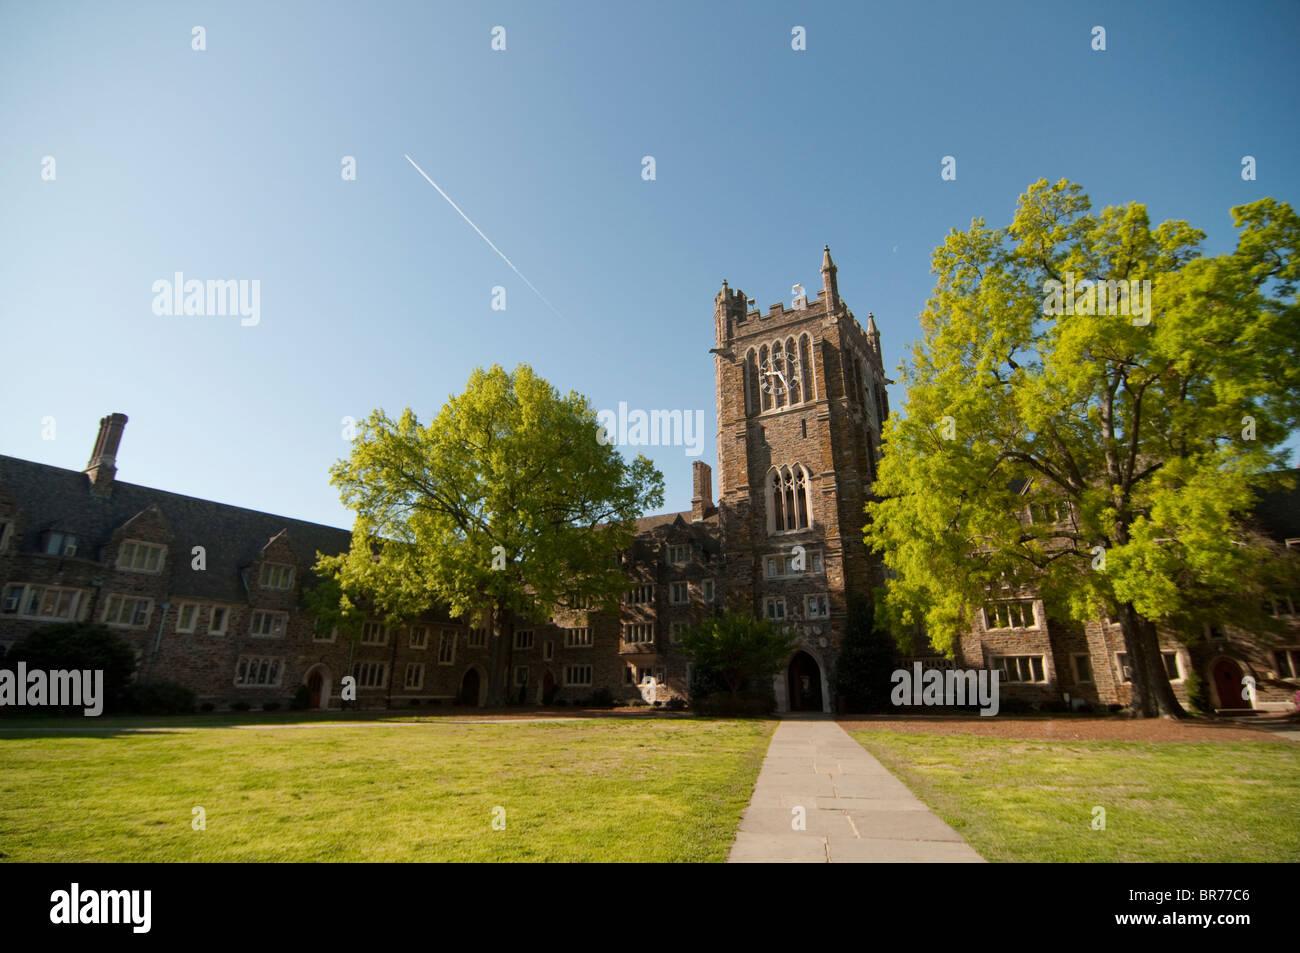 Clocktower Quad on Duke University's West Campus in Durham, North Carolina, USA. Stock Photo